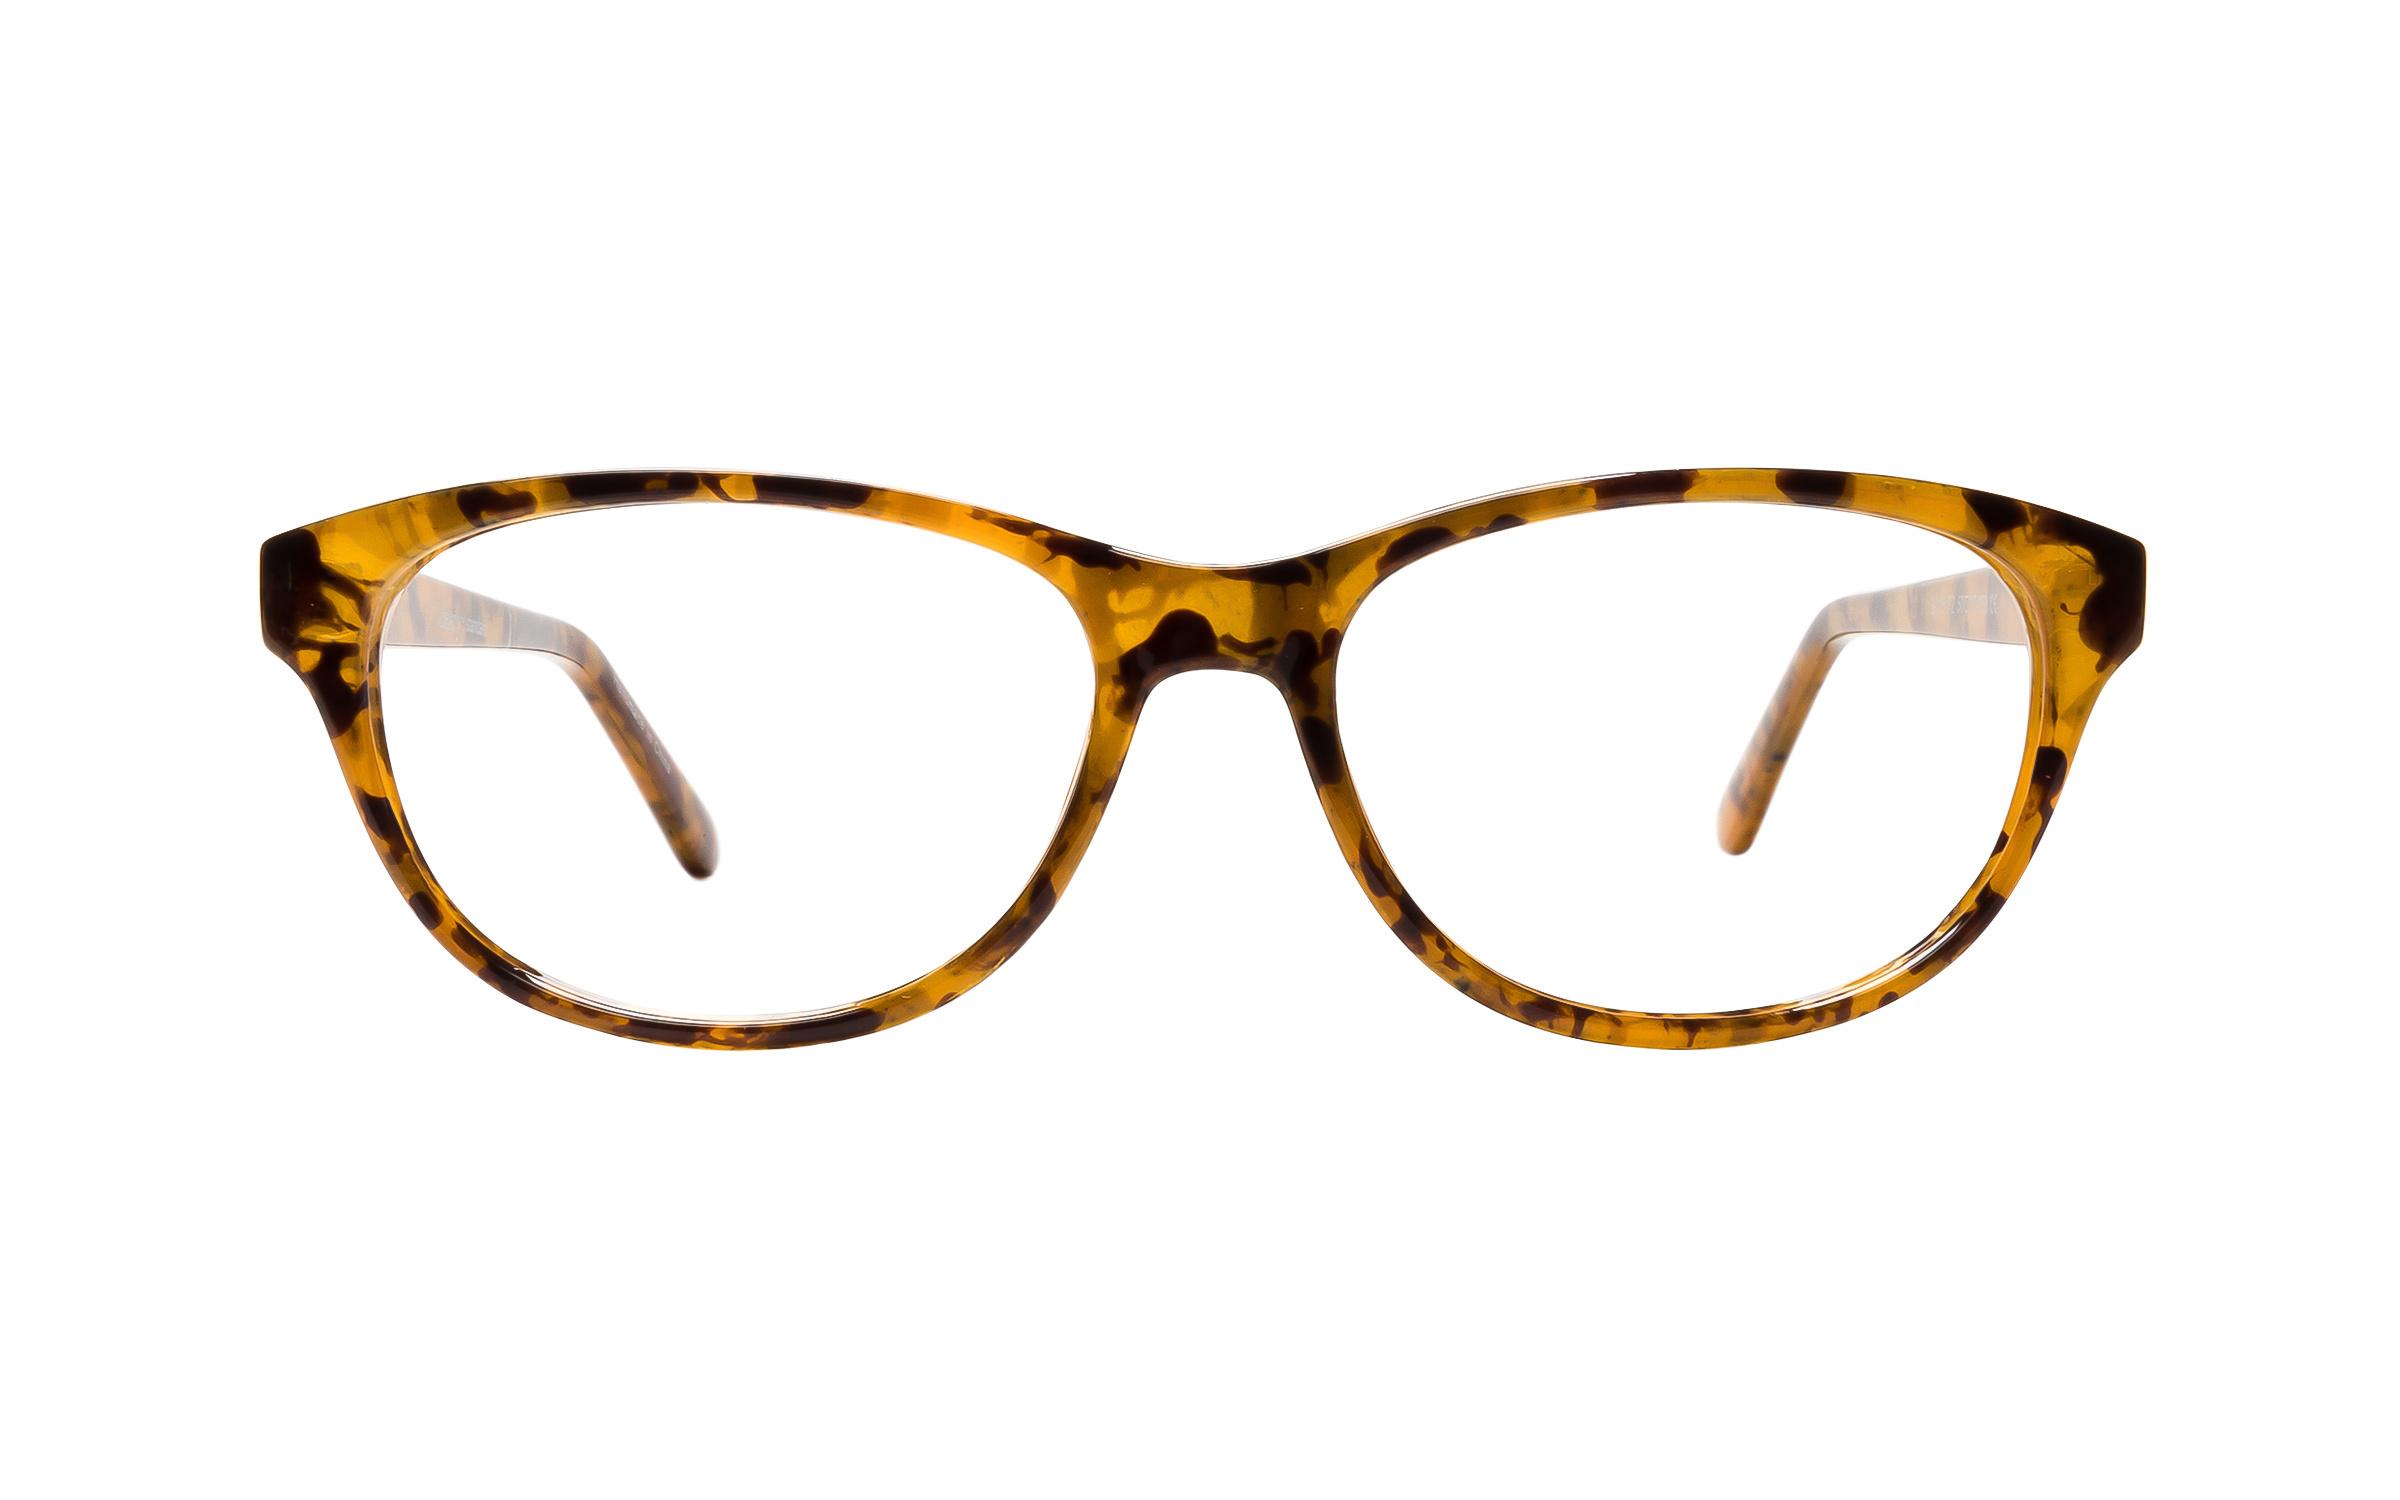 Clearly Basics Milllertown G015 T2 (50) Eyeglasses and Frame in Light Brown/Tortoise | Plastic - Online